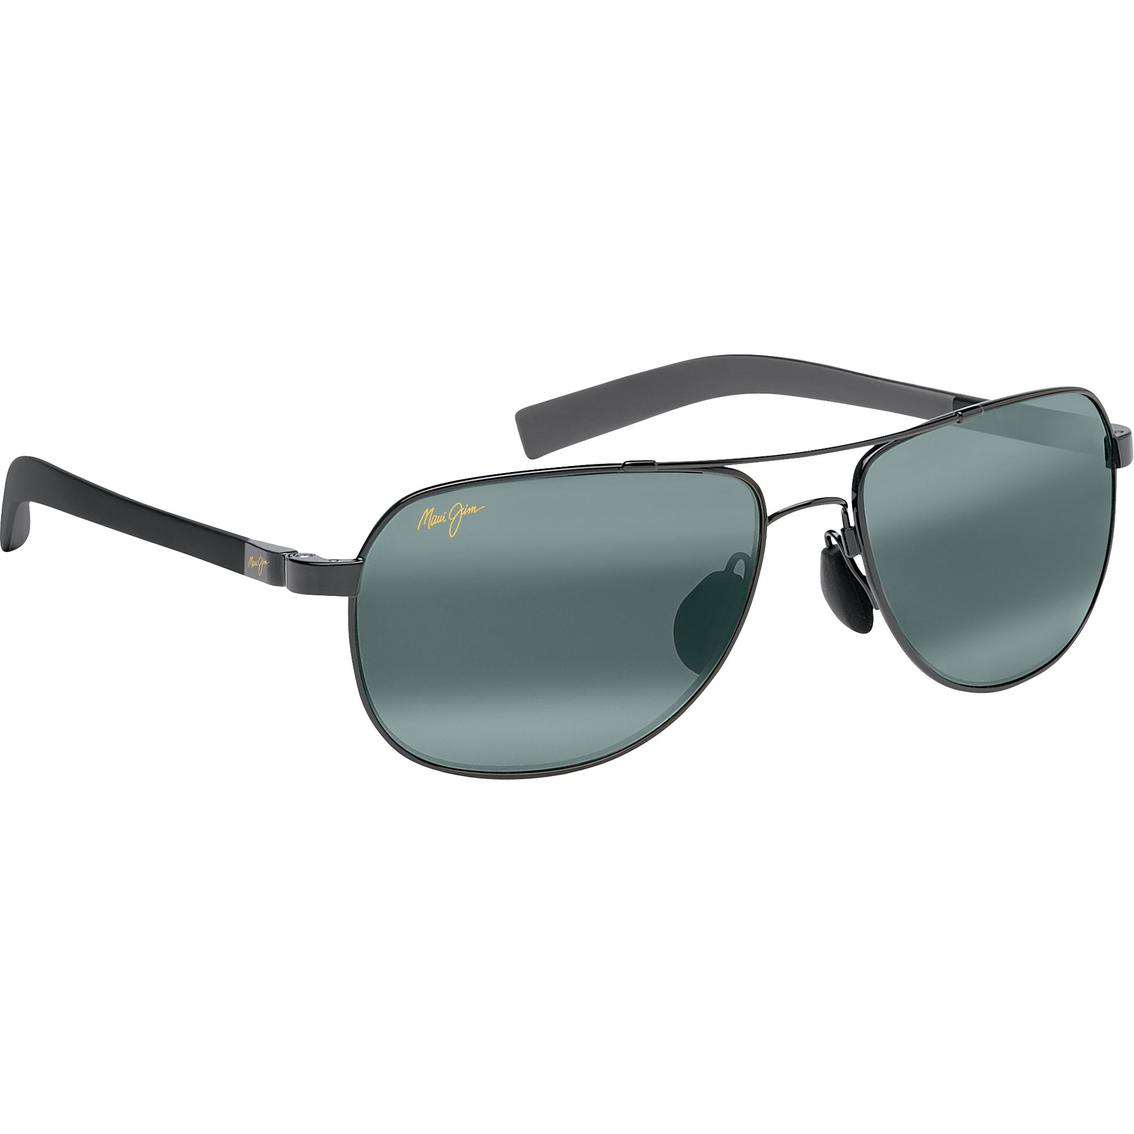 ff28497235 Maui Jim Guardrails Sunglasses